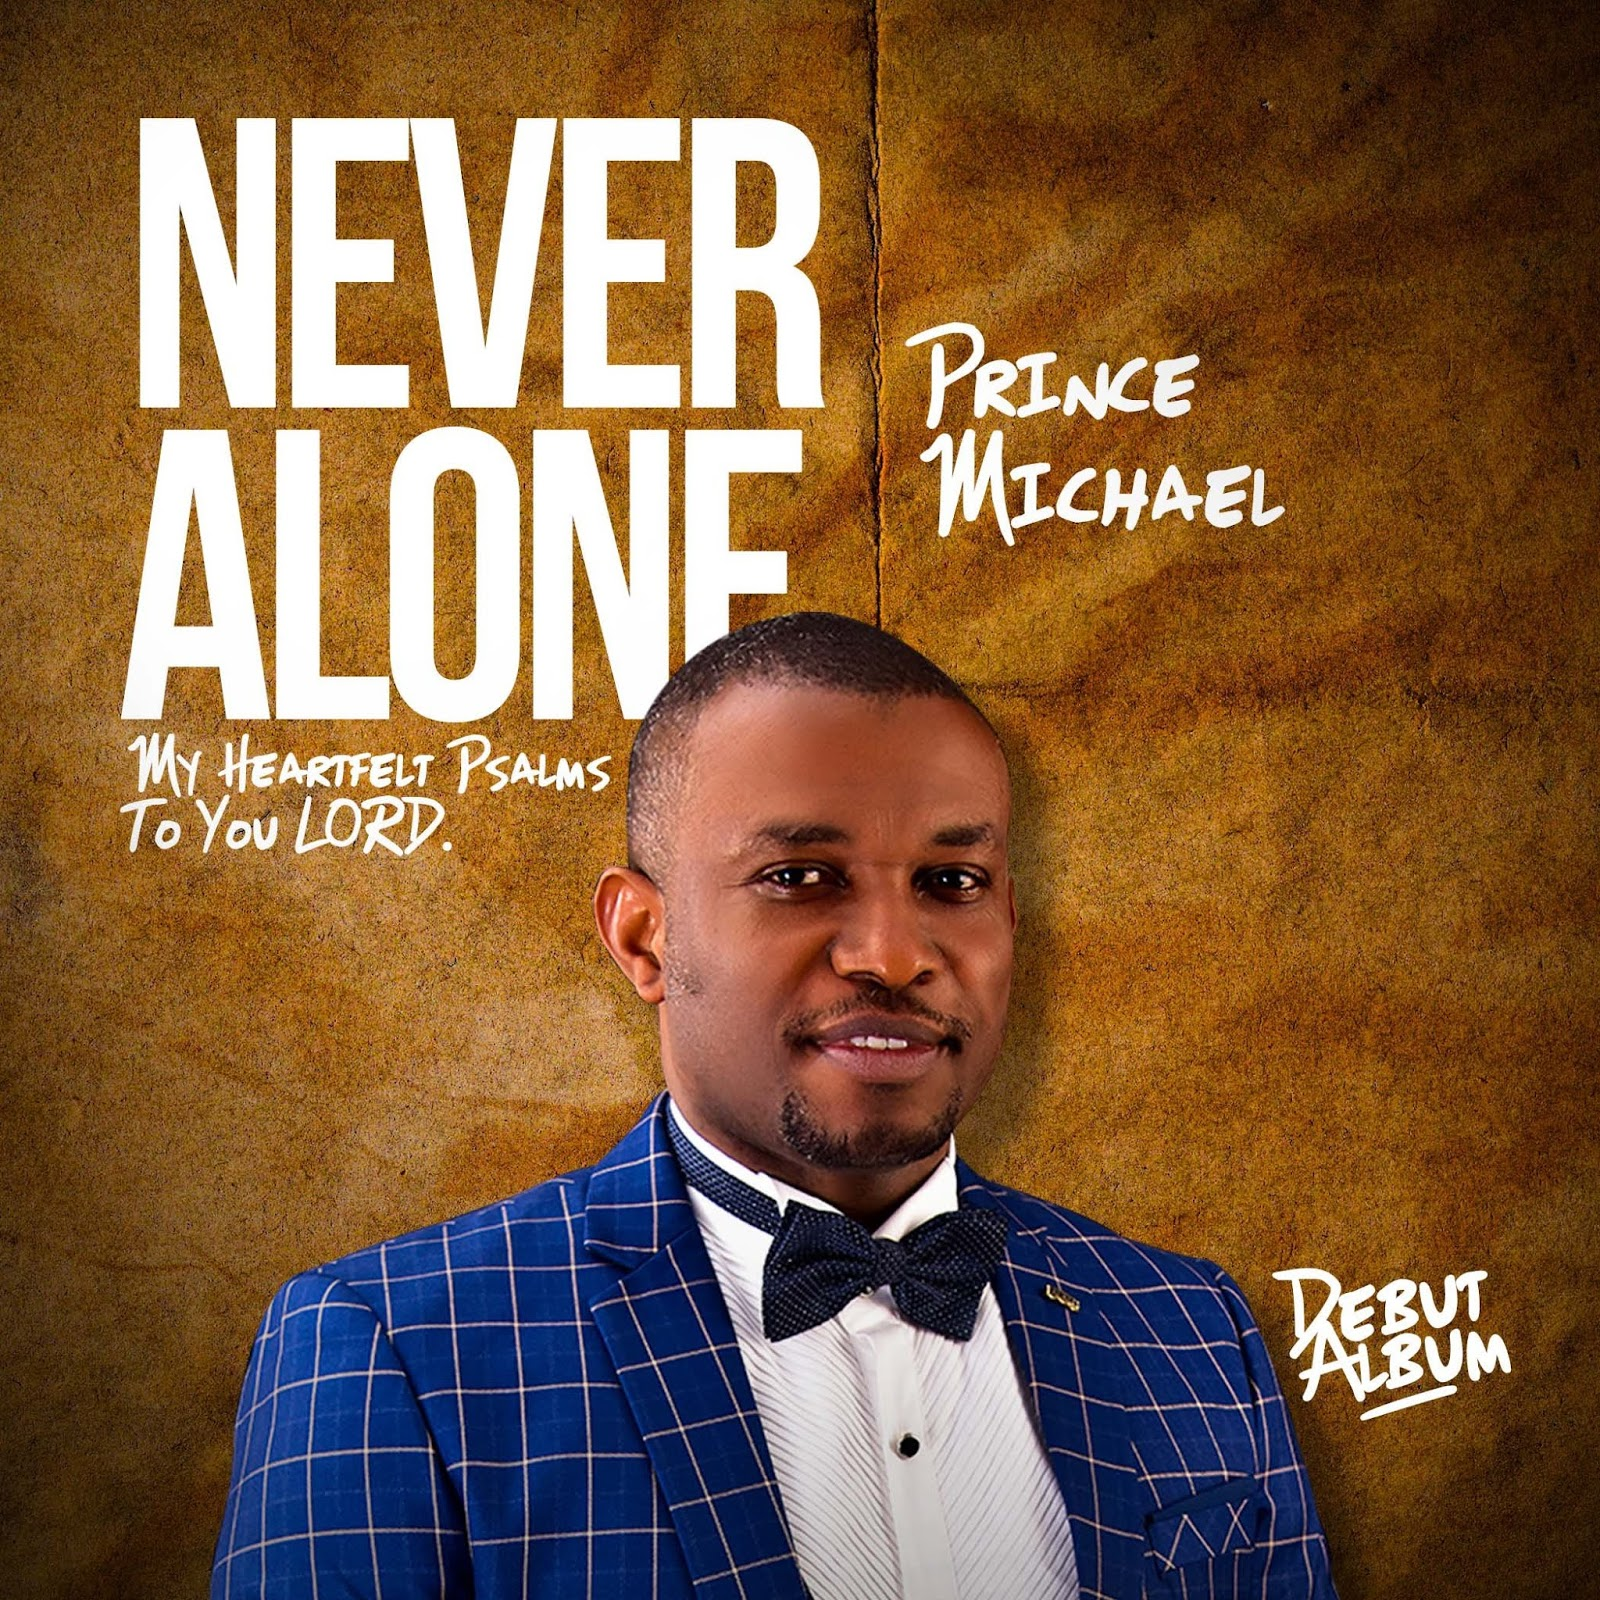 Prince Michael - Never Alone Mp3 Download